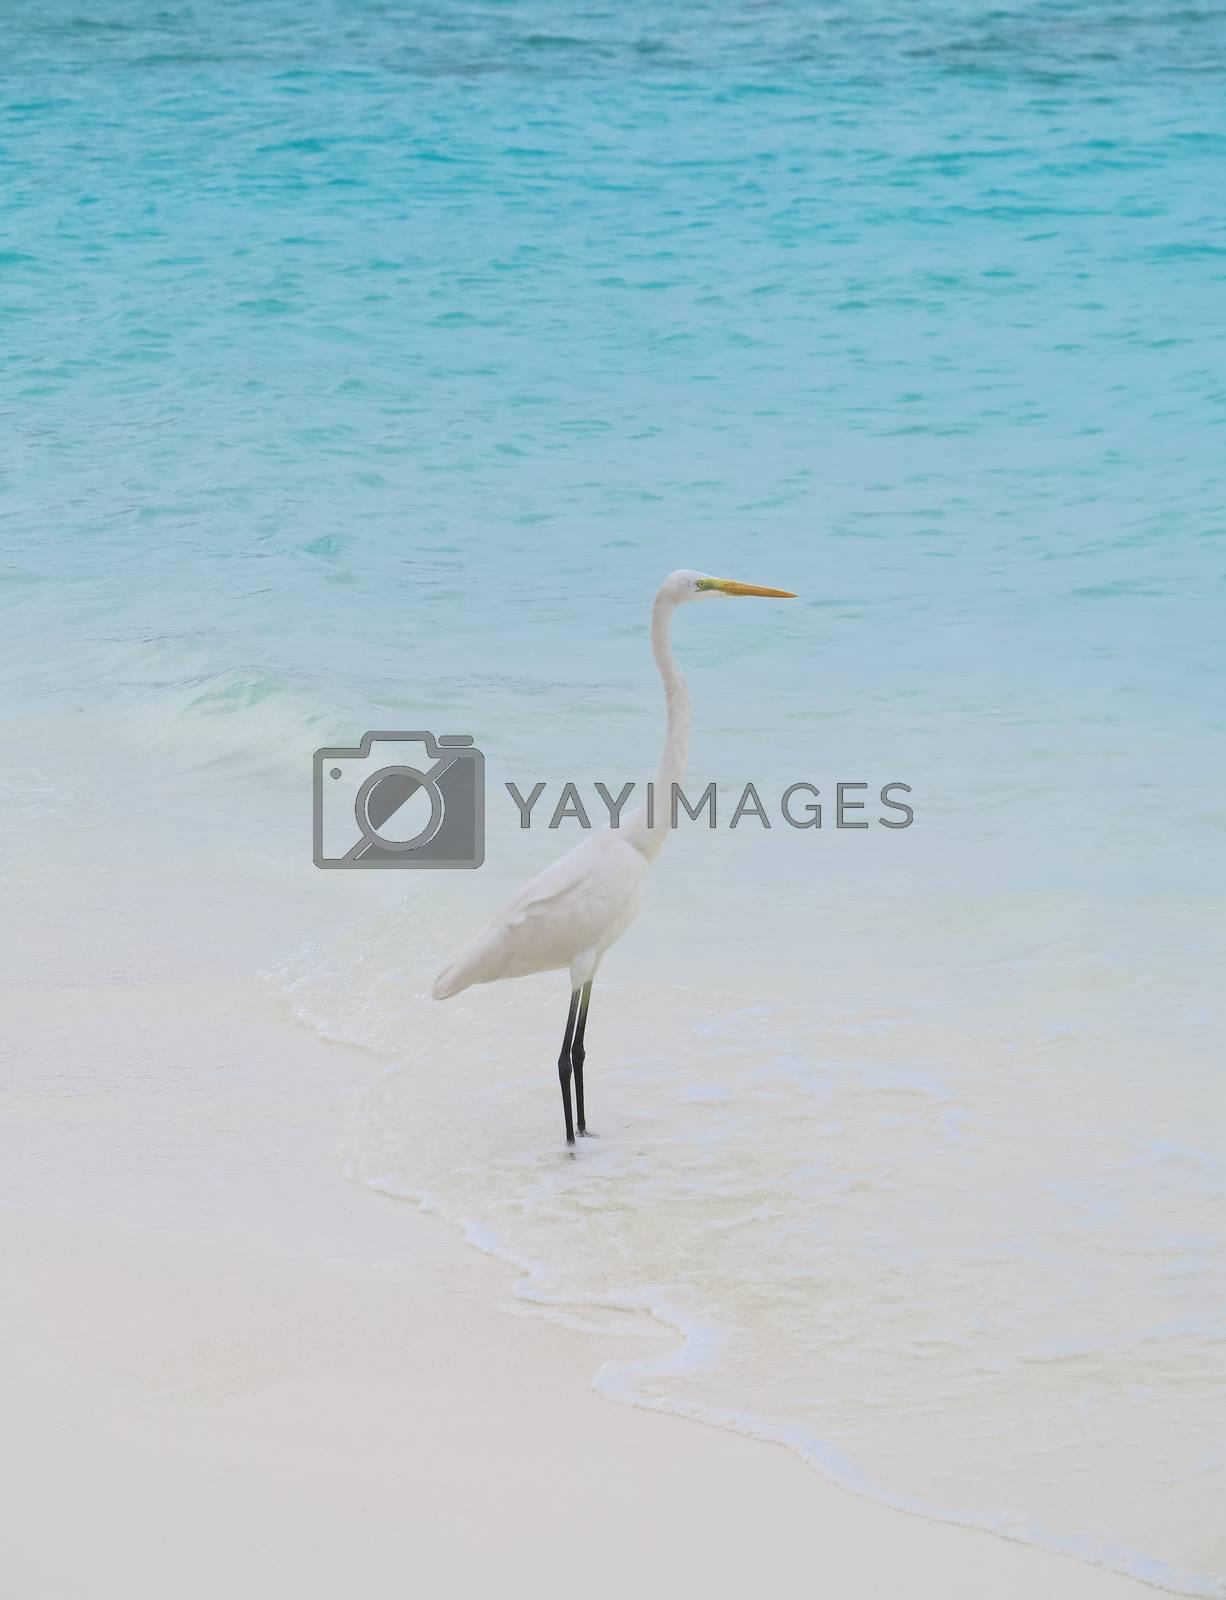 Grey Heron stands on the beach near the sea